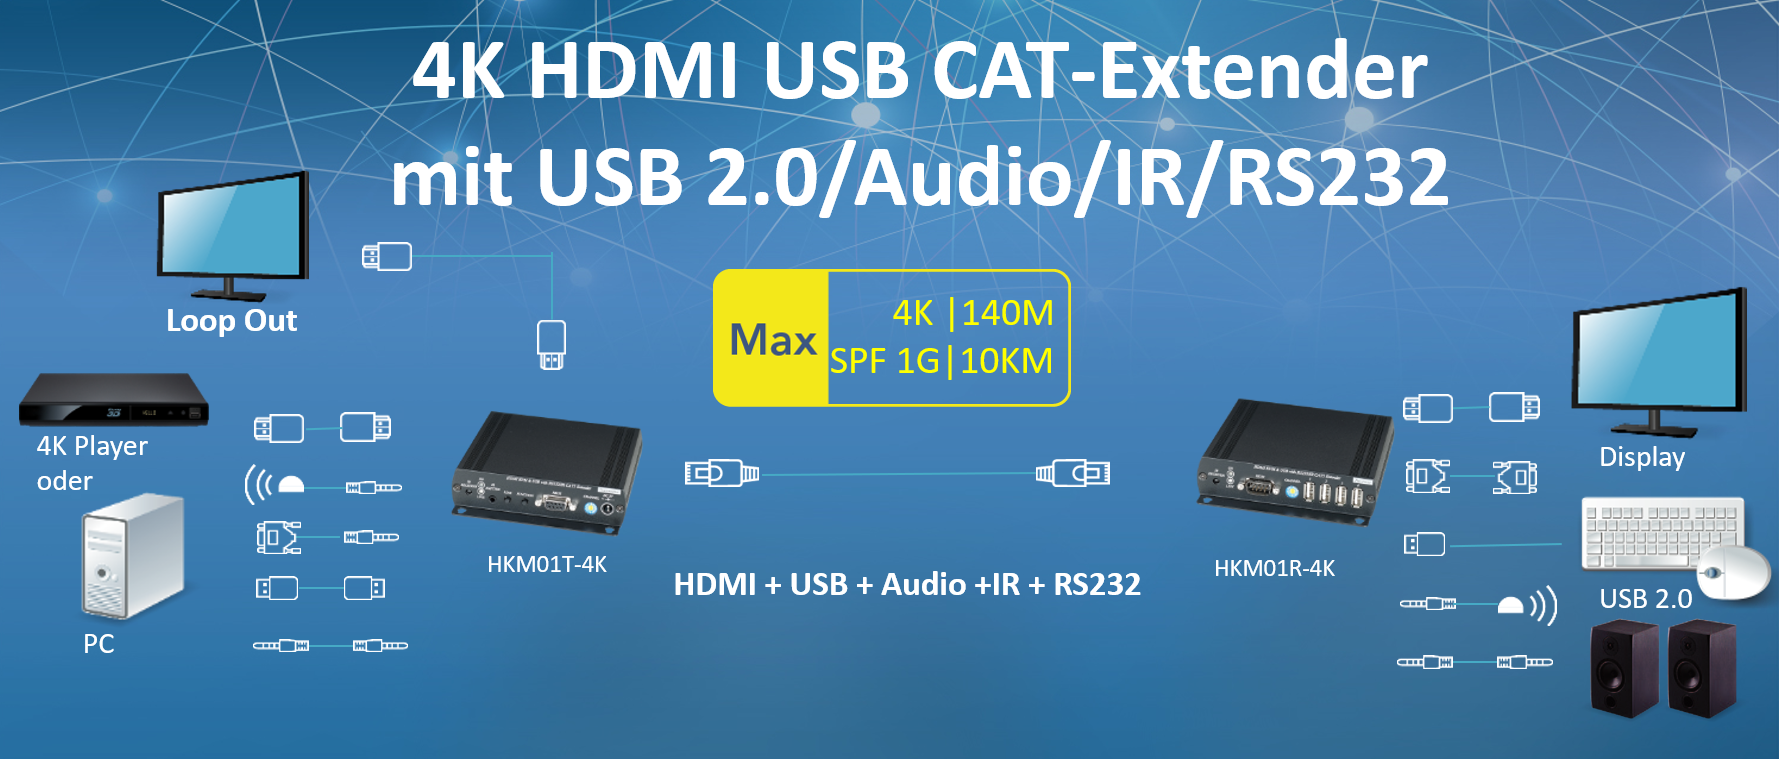 4K + 1080p HDMI + USB 2 0 + Audio + RS232 + IR HDMI Extender